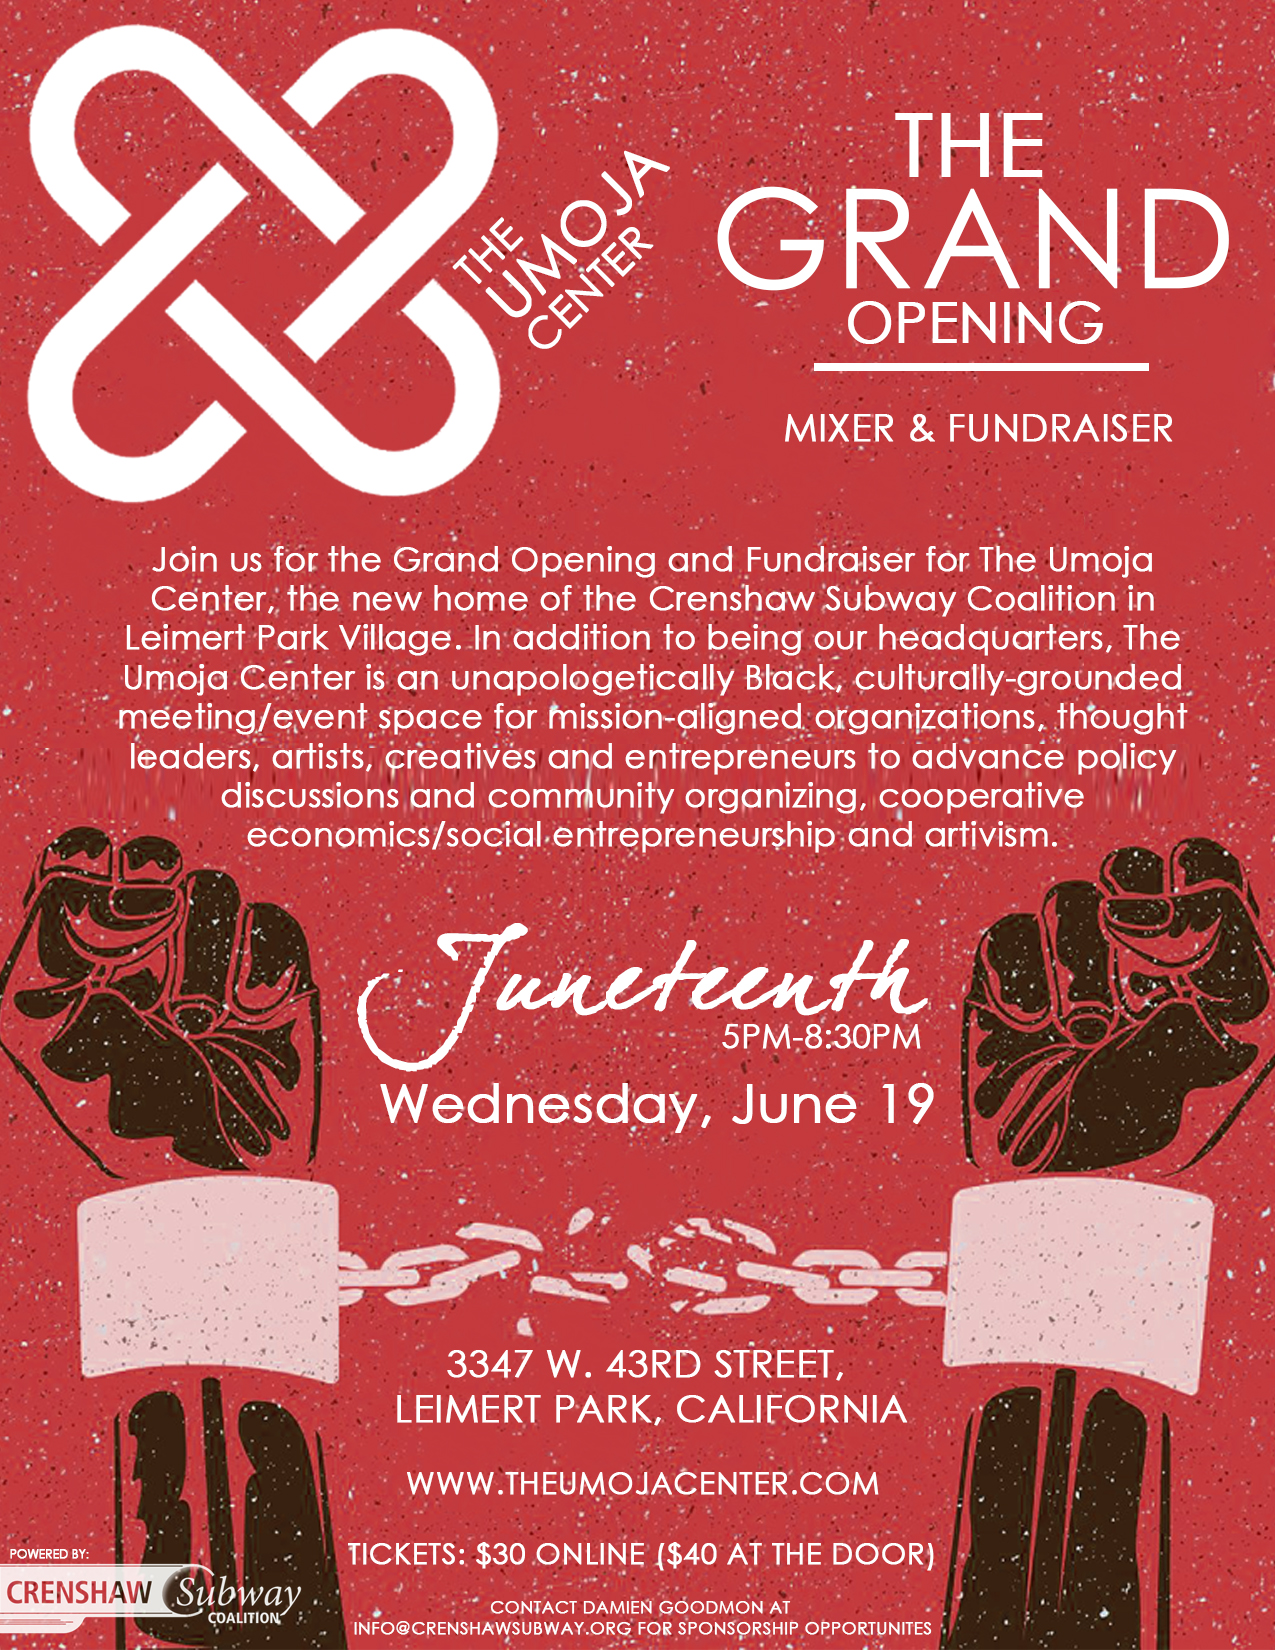 The Umoja Center Grand Opening & Fundraiser